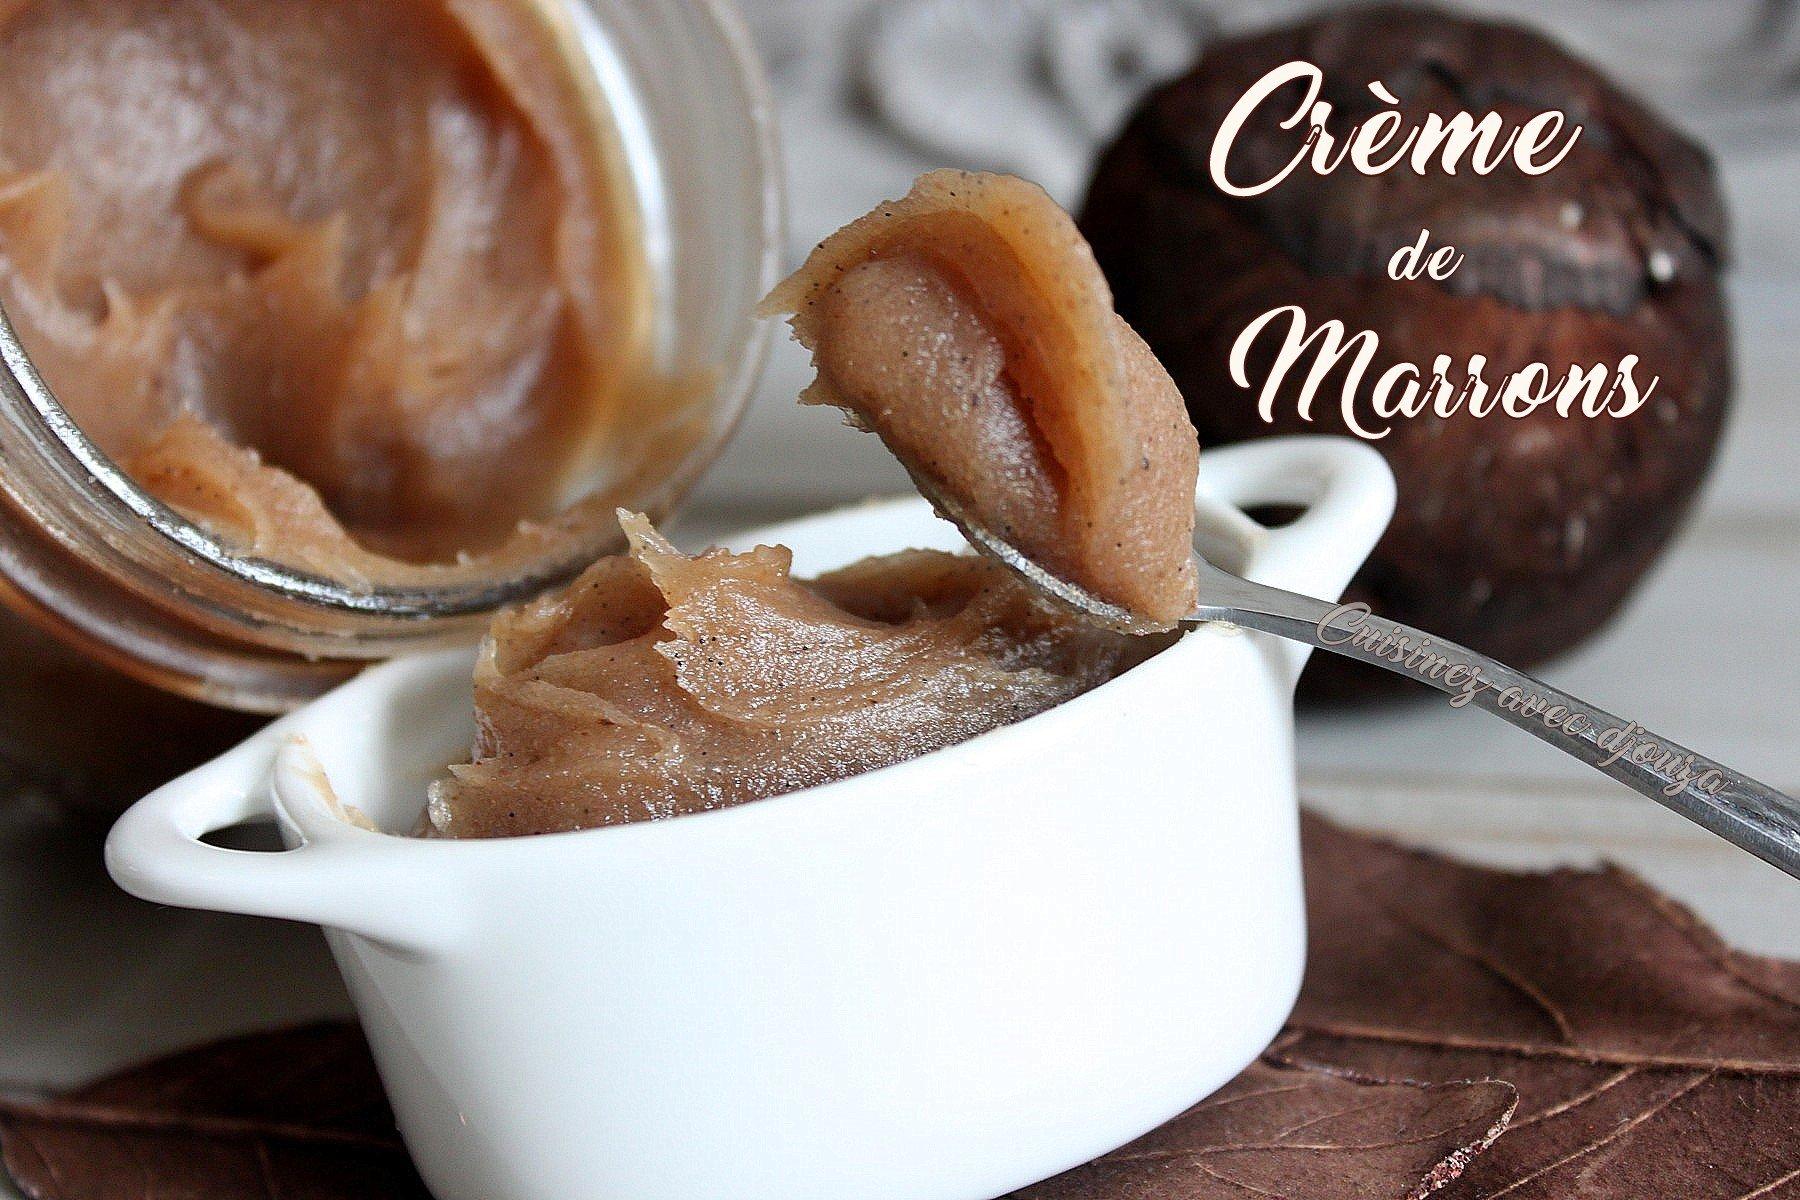 recette de la cr u00e8me de marrons ou ch u00e2taignes